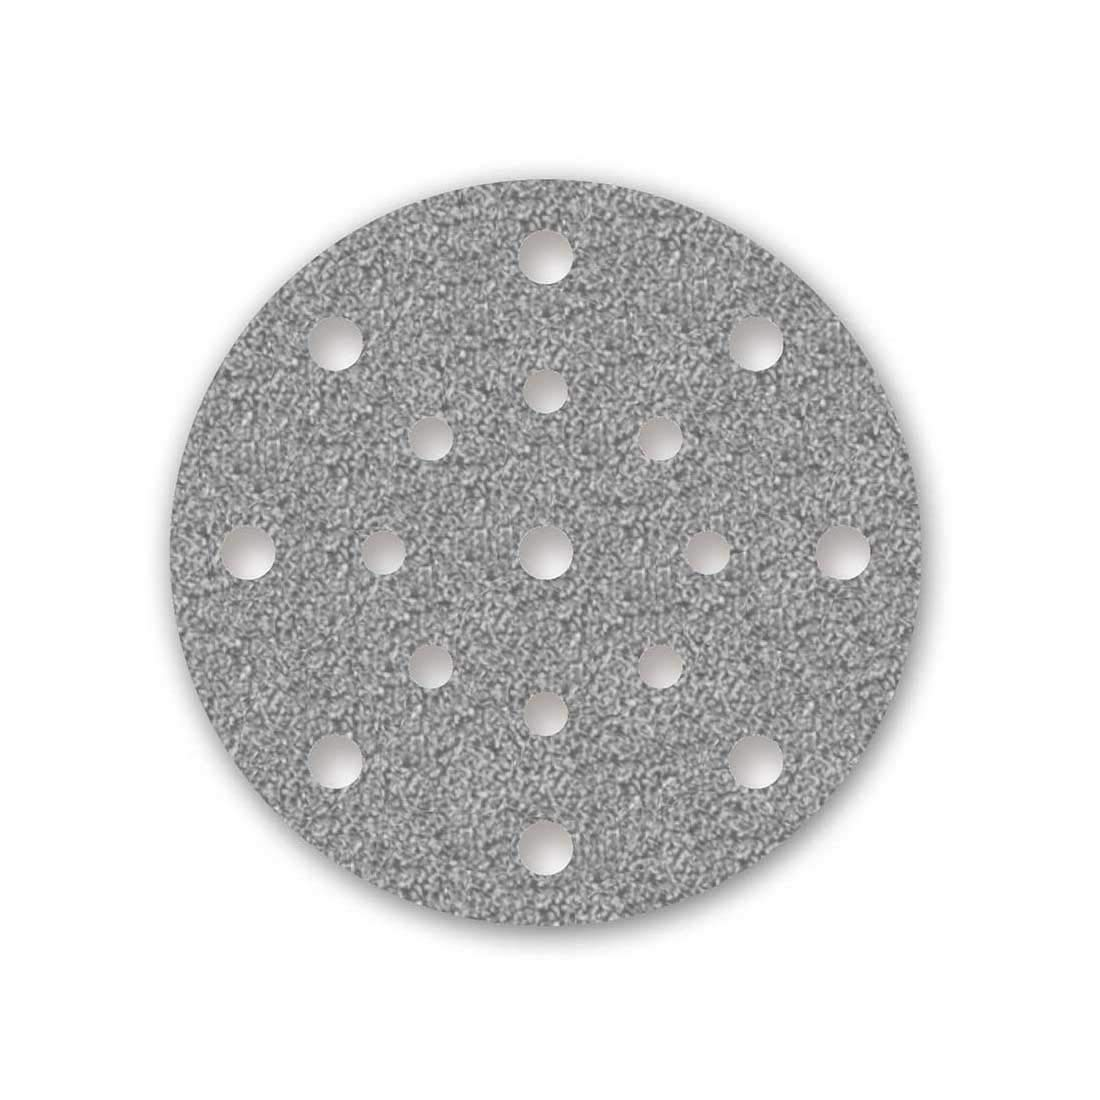 /Ø 150 mm 50 Dischi abrasivi velcrati MENZER per levigatrice roto orbitale Grana 40-17 fori